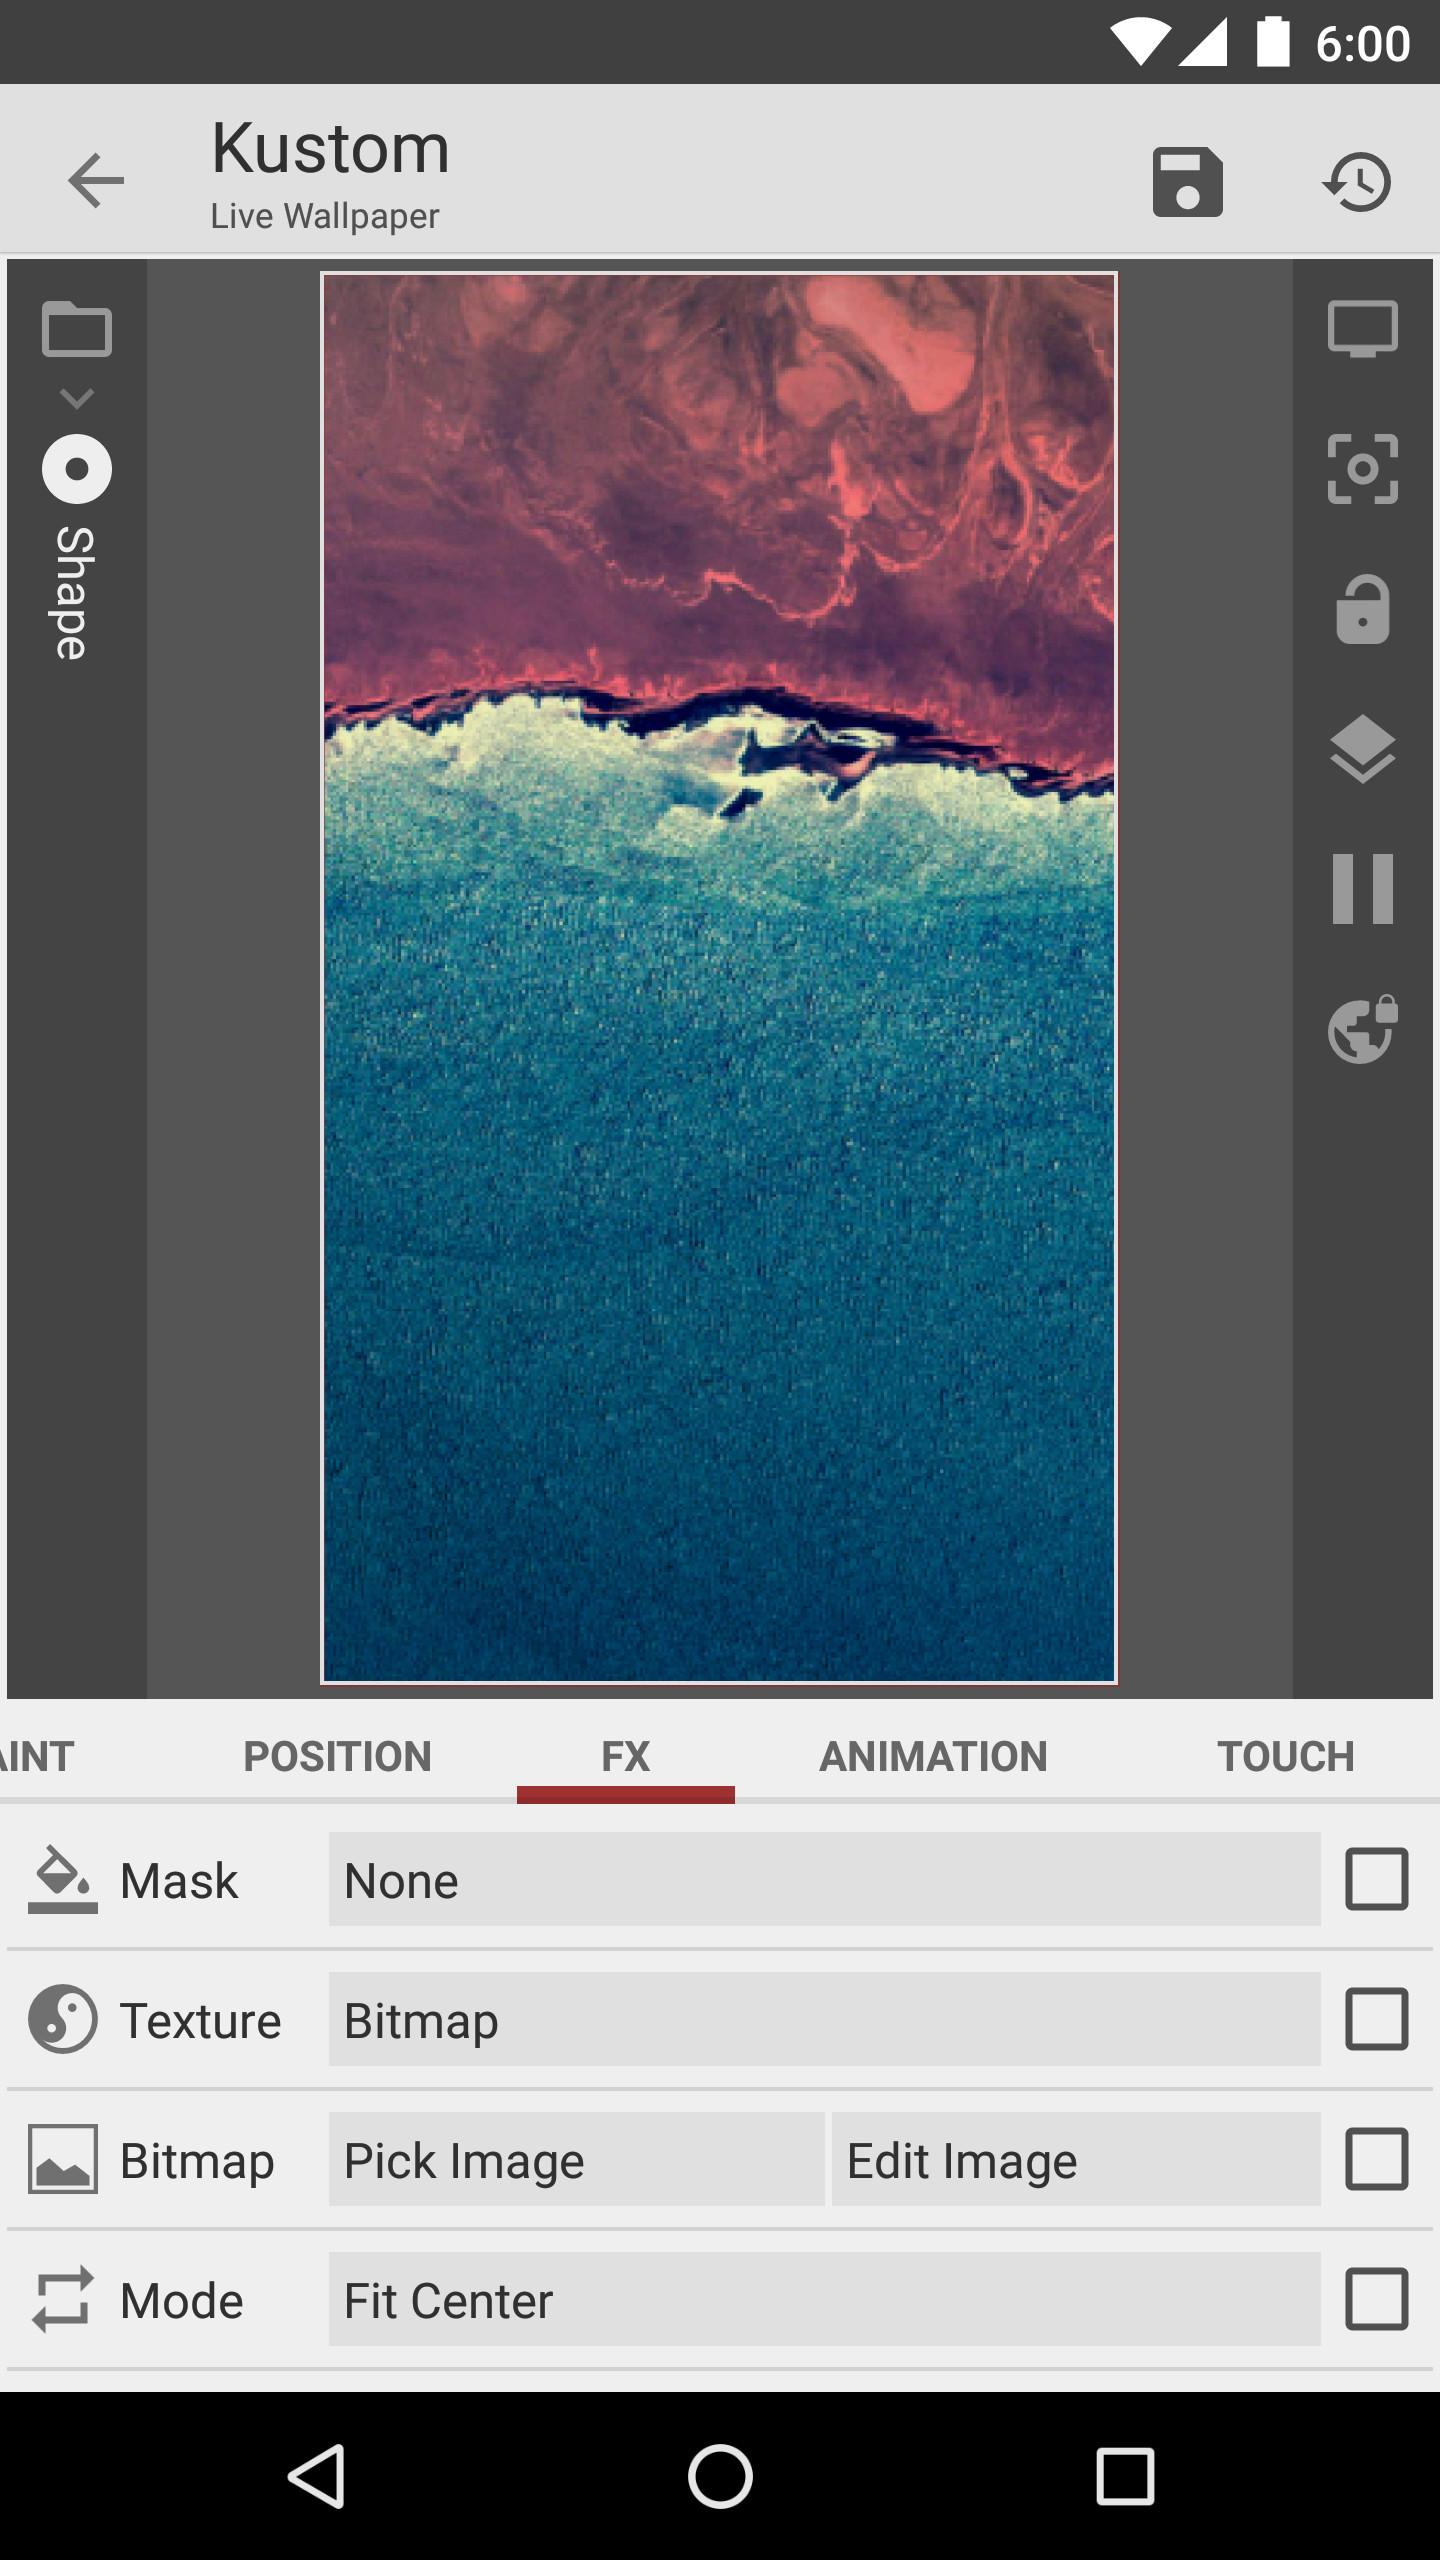 Live Wallpaper For Iphone Cydia Set Live Wallpaper Lock Screen 85 Images